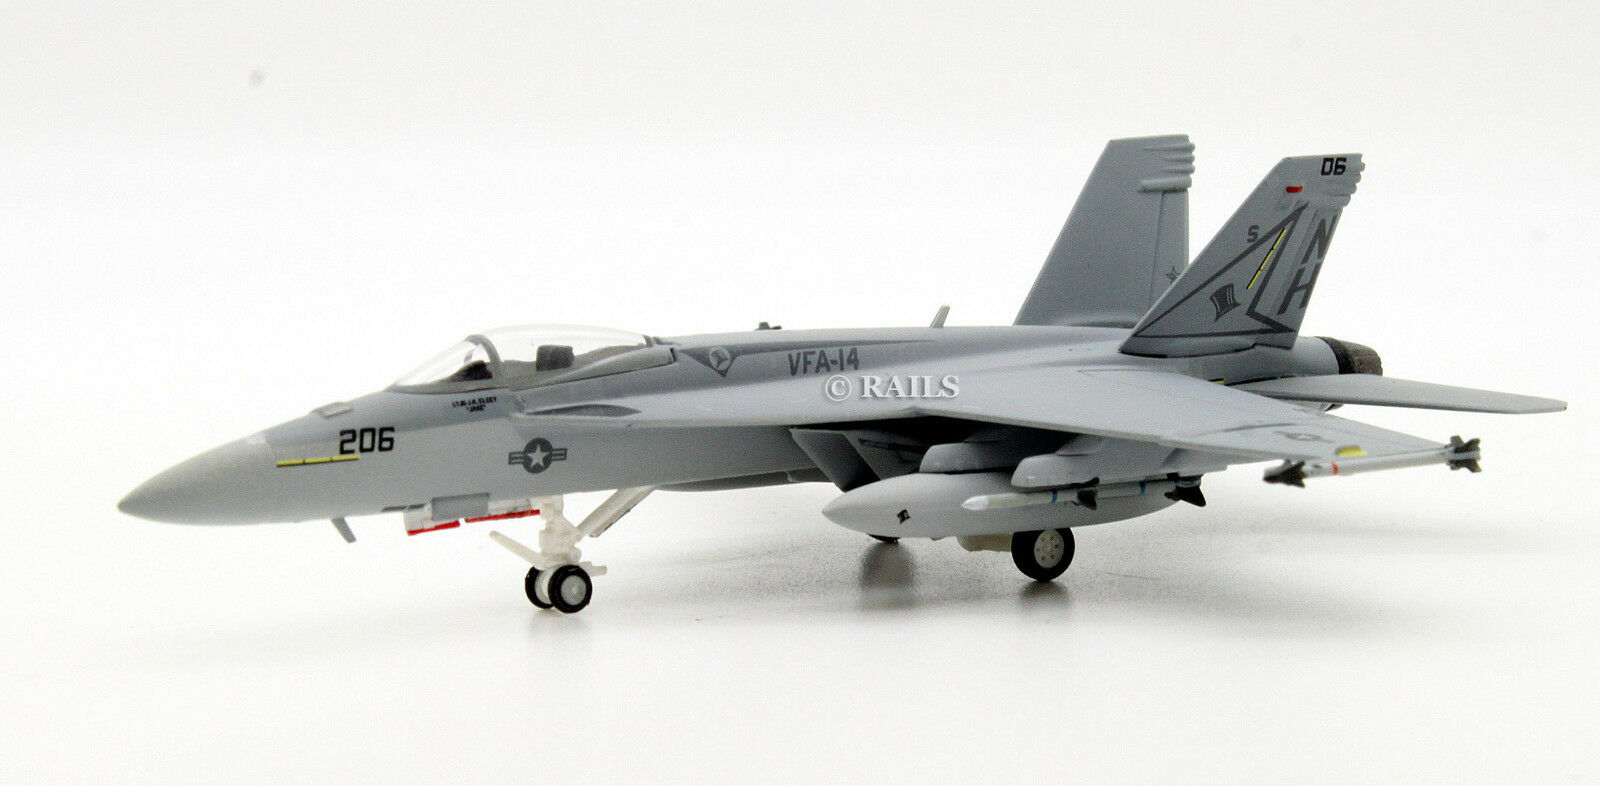 HOGAN WINGS 1 200 6290 F A-18E US NAVY VFA-14  TOPHATTERS  CVW 11 NAS LEMOORE